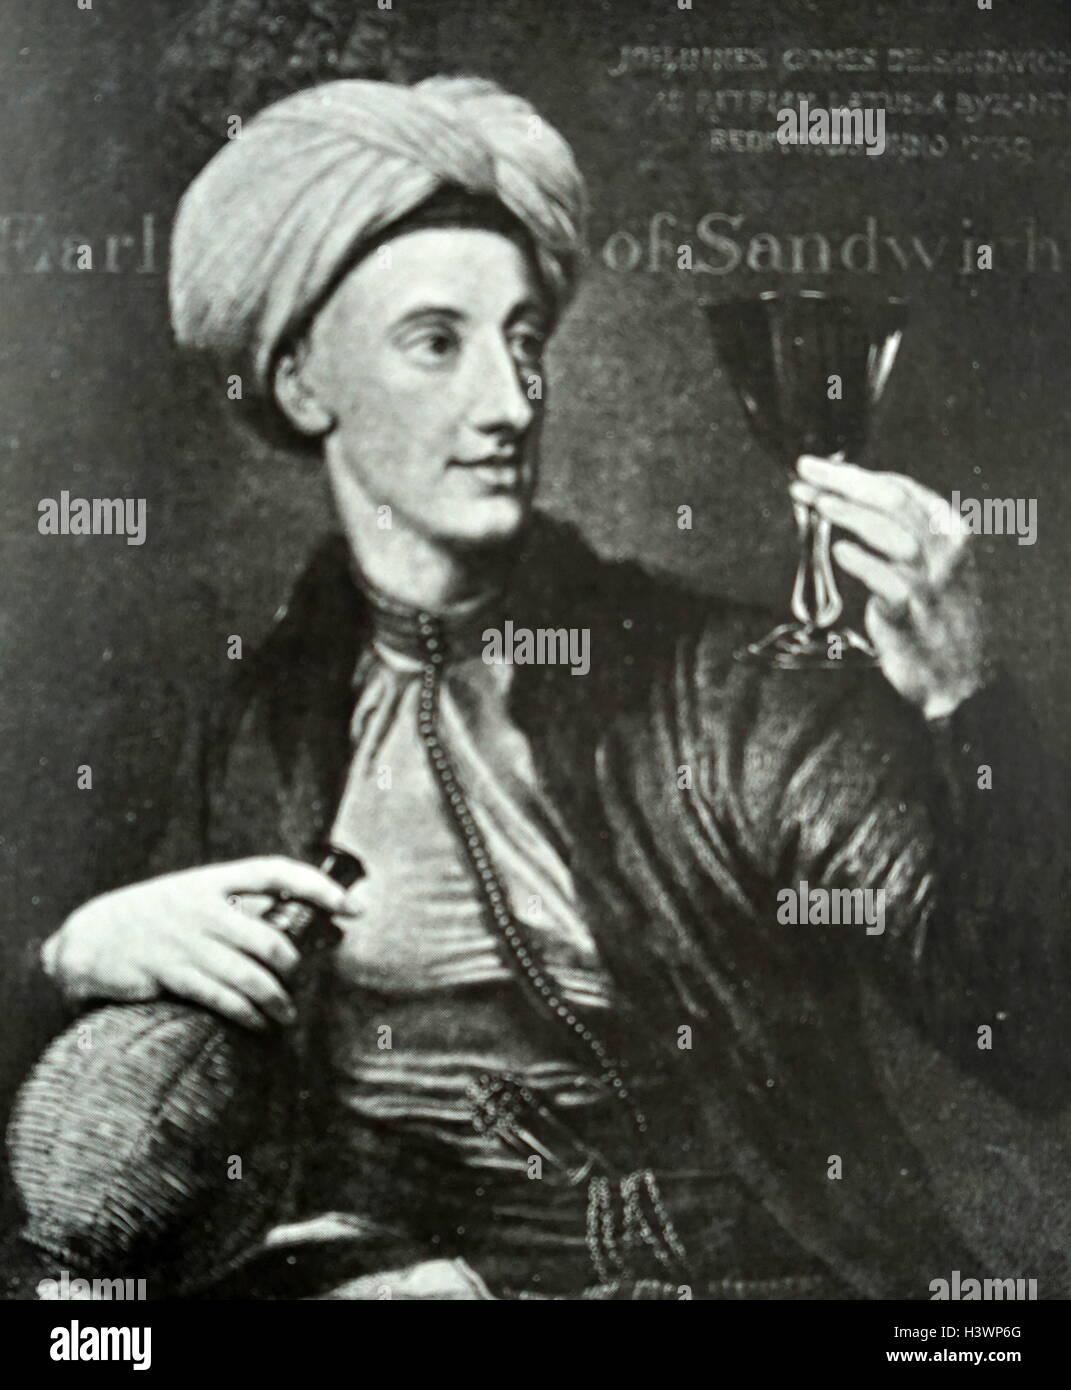 Portrait of John Montagu, 4th Earl of Sandwich by George Knapton - Stock Image